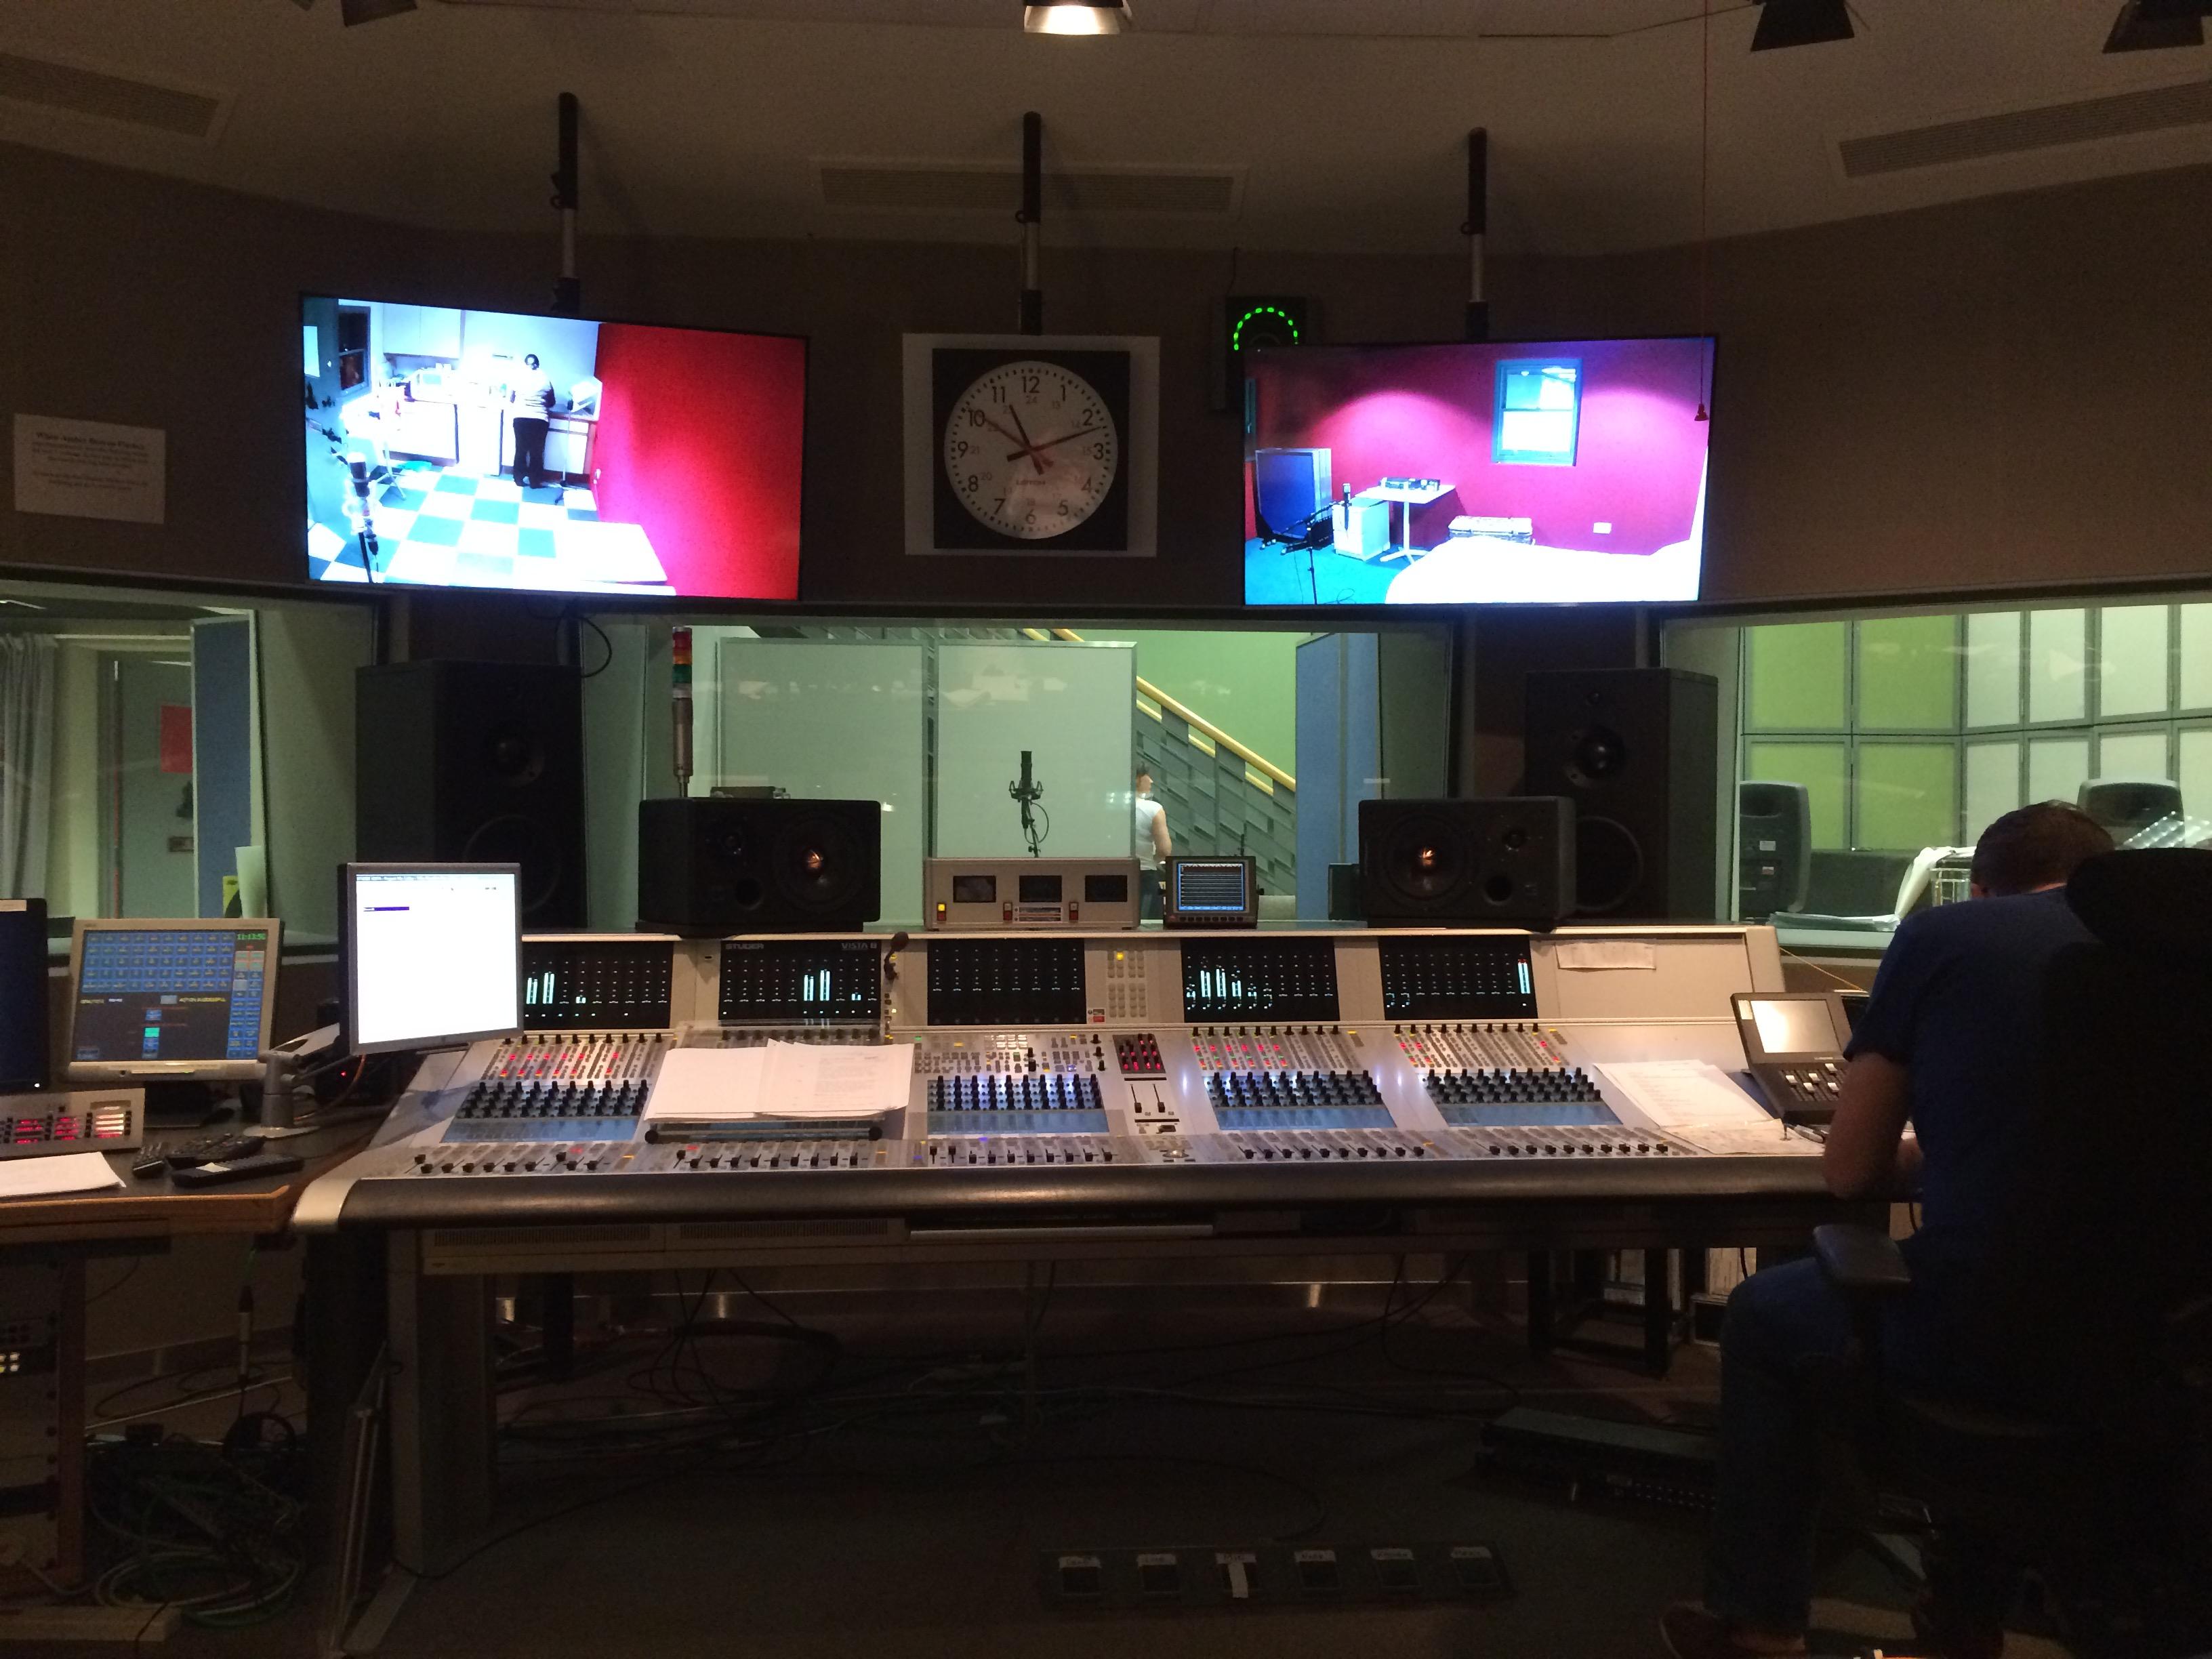 BBC Drama studio